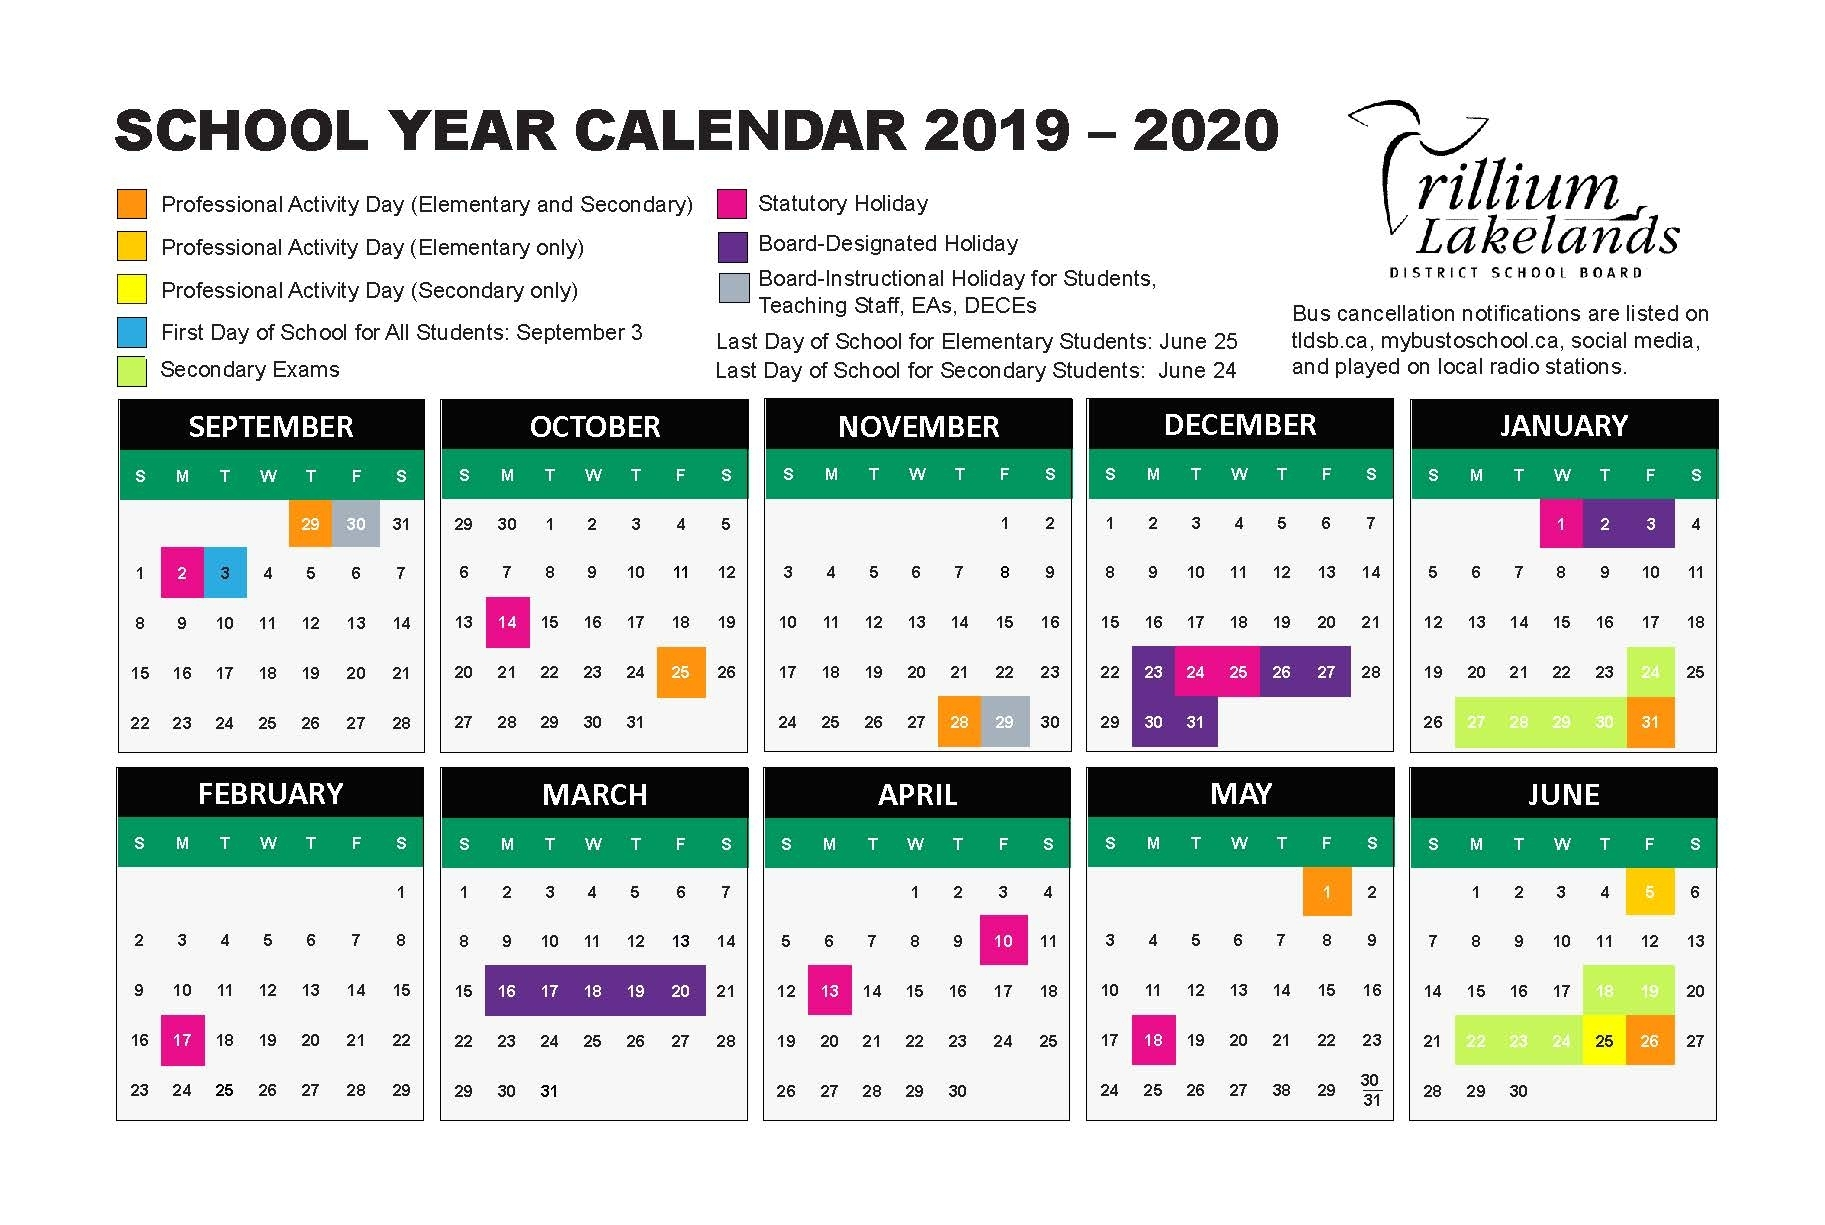 School Year Calendar – Trillium Lakelands District School Board with regard to U Of R Calendar 2019-2020